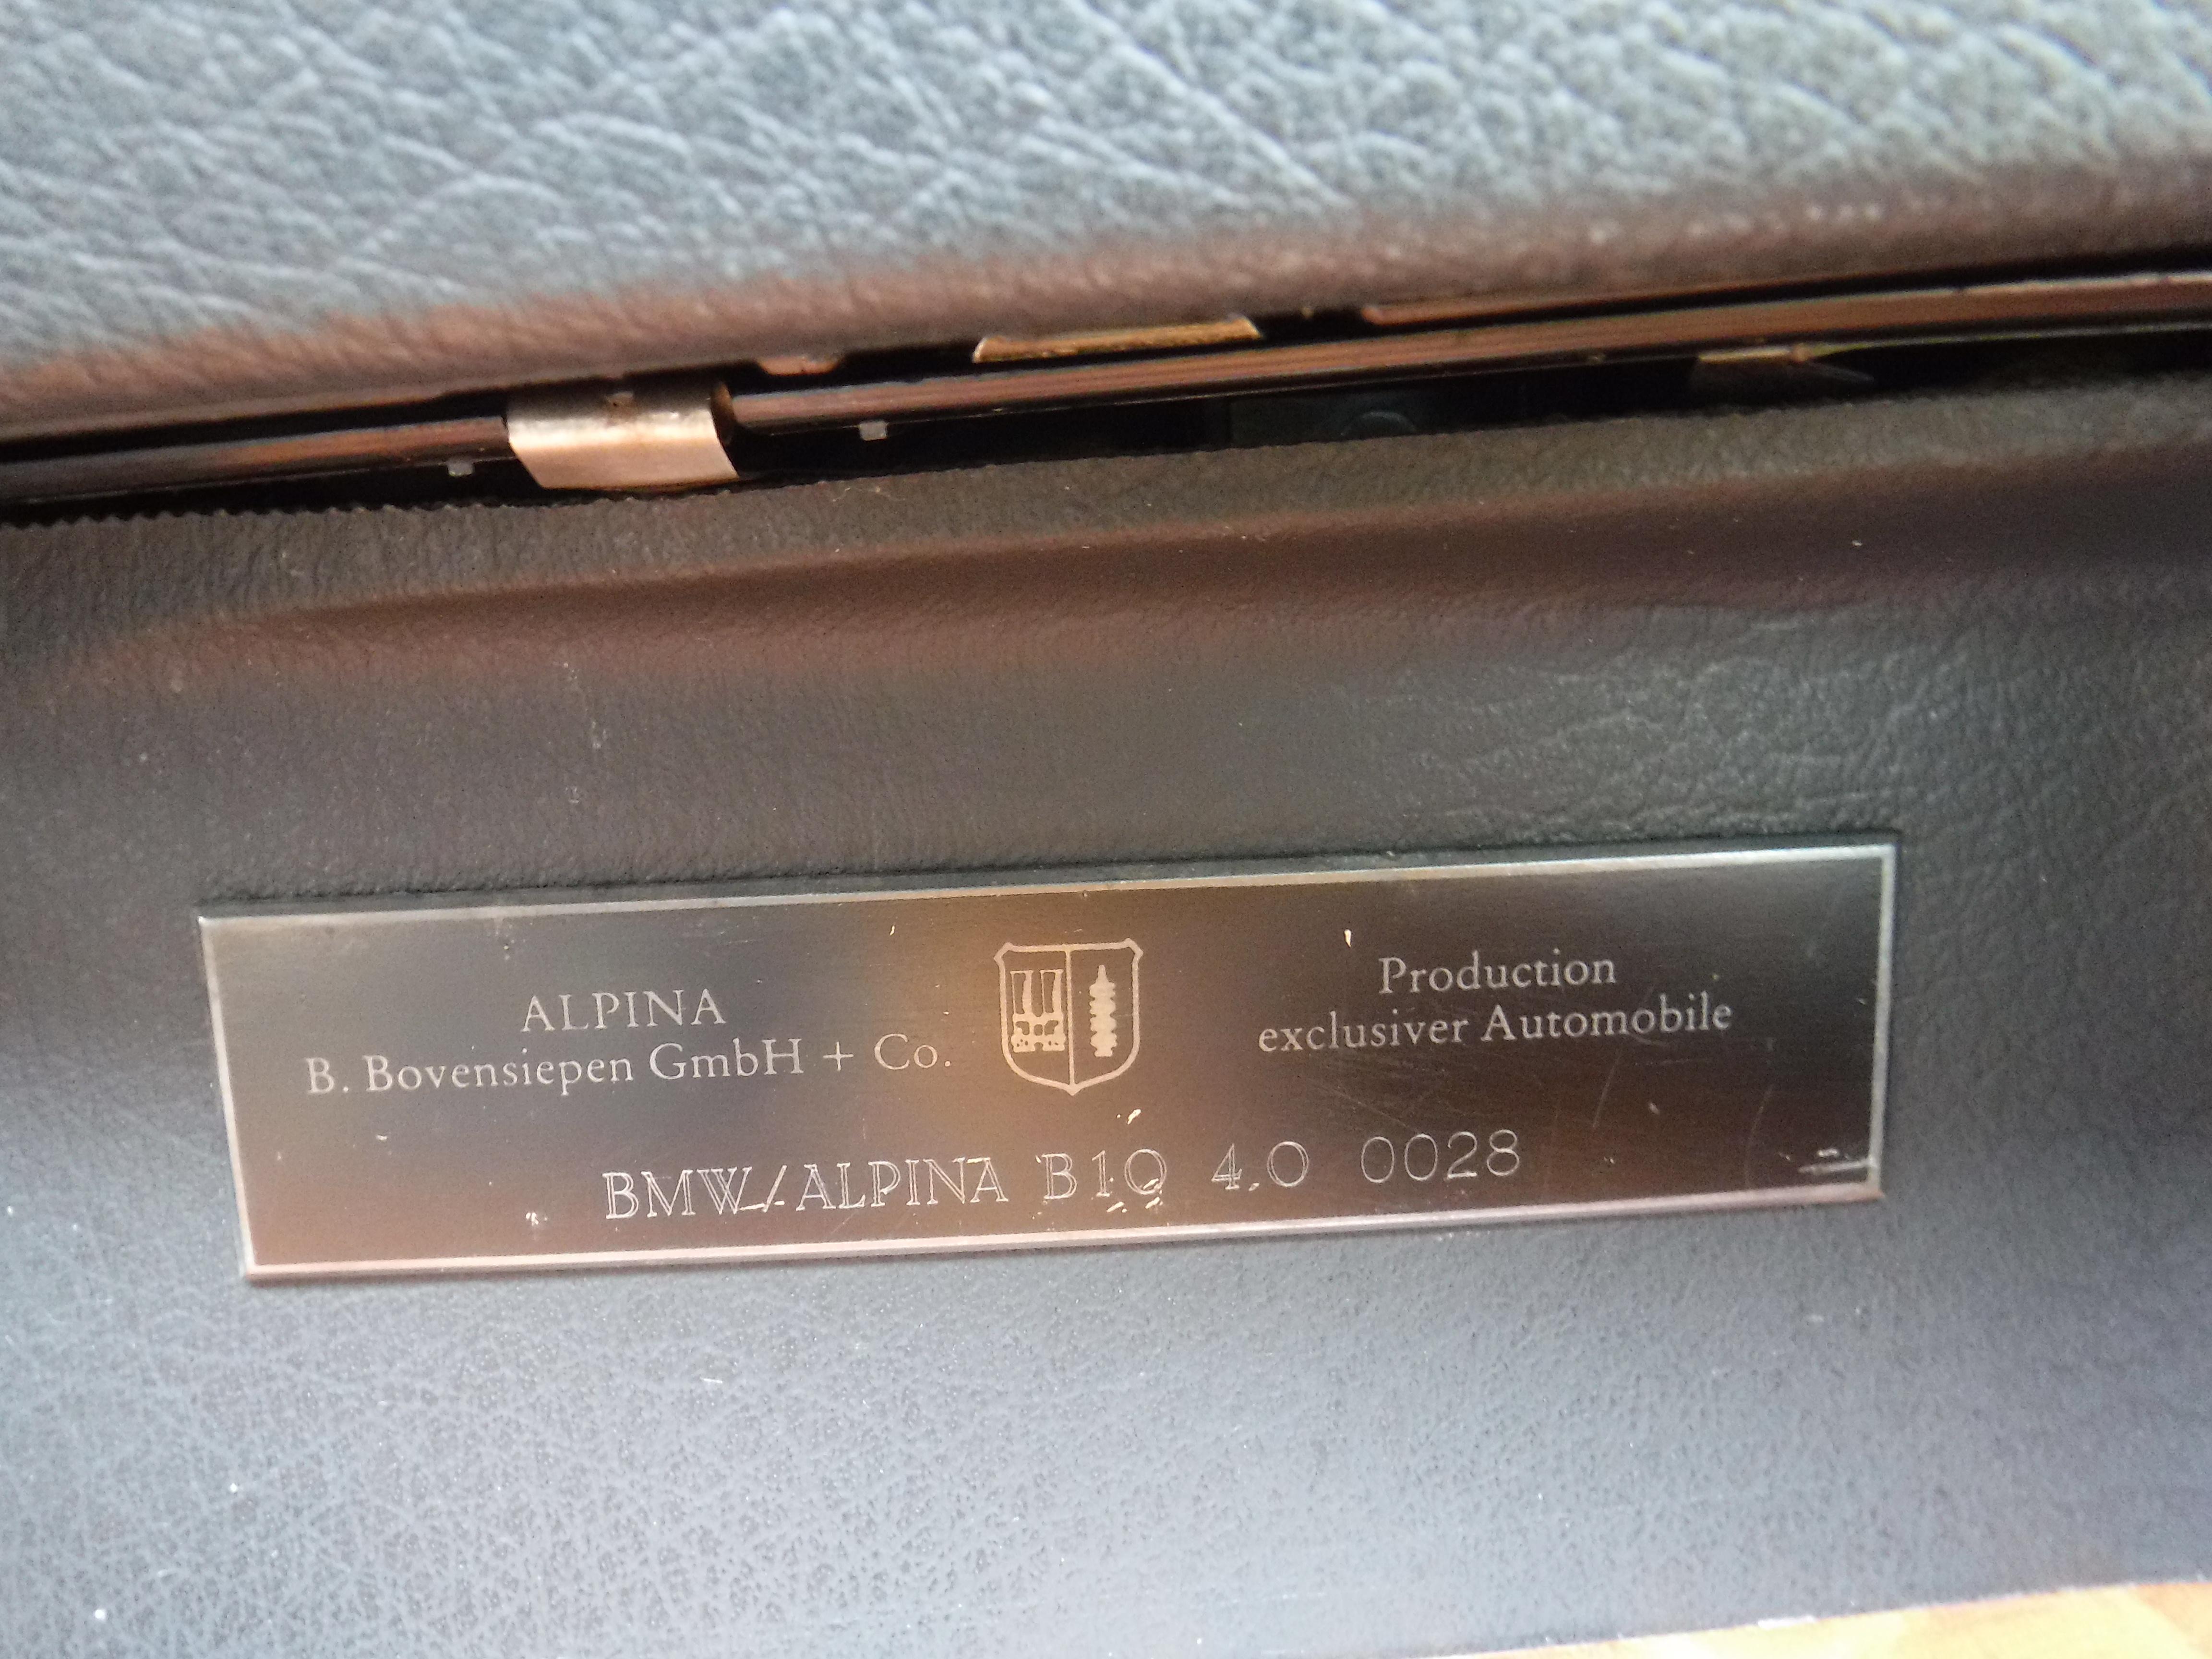 BMW ALPINA E34 B10 4.0